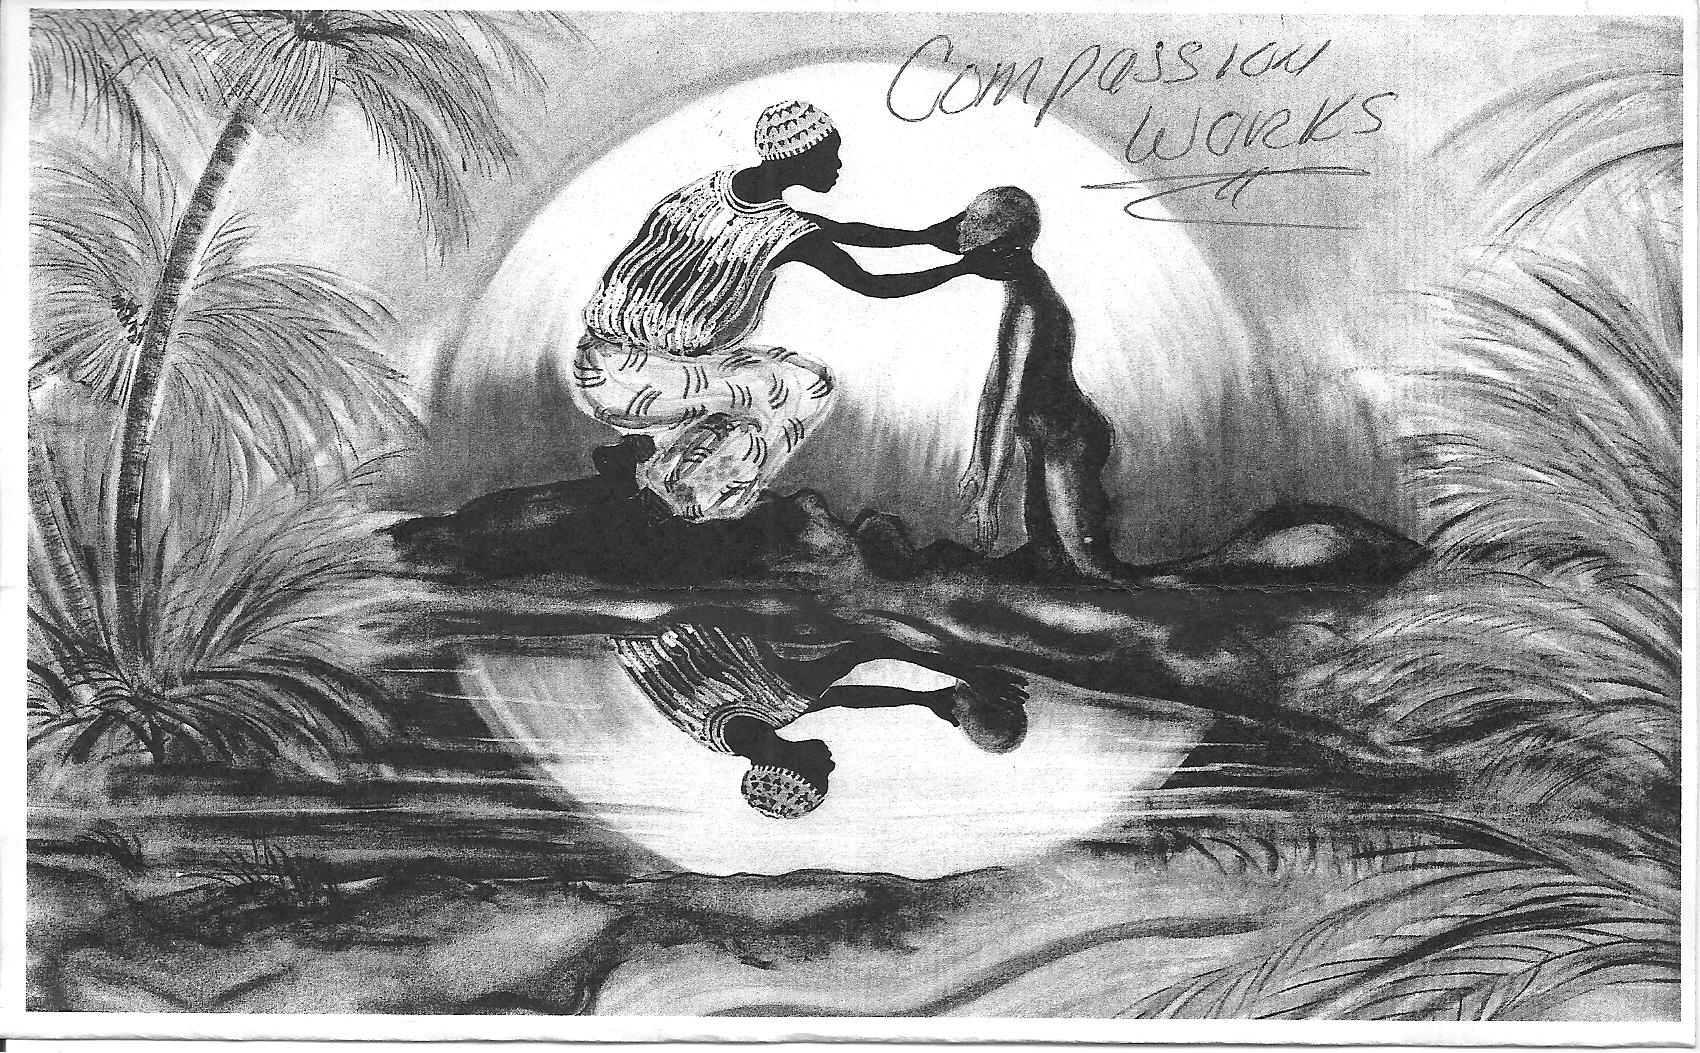 K. Muldrew CWFA drawing 001.jpg